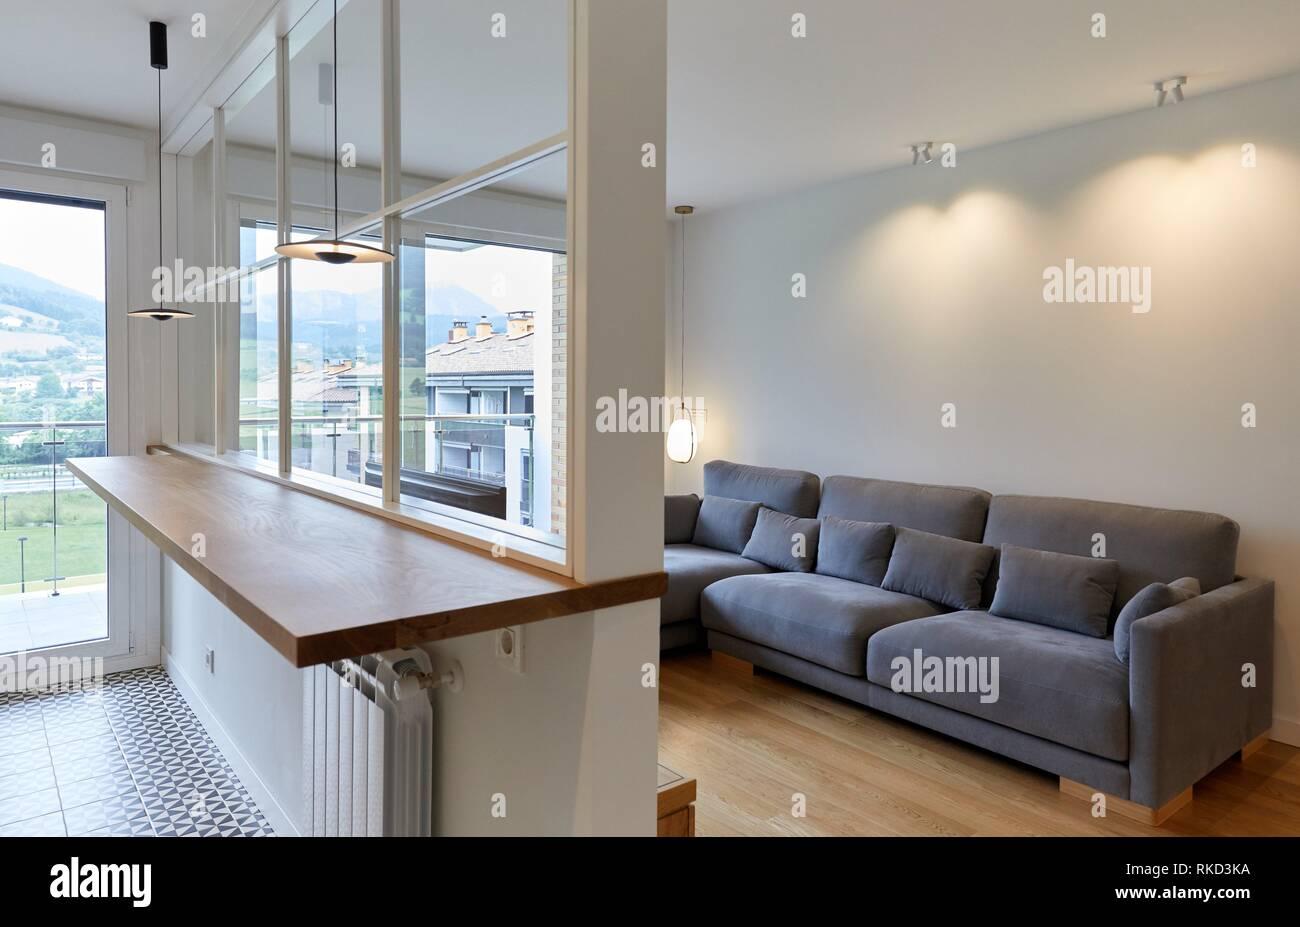 Living room and kitchen, Illumination, Interior decoration of housing, Oñati, Gipuzkoa, Basque Country, Spain, Europe - Stock Image